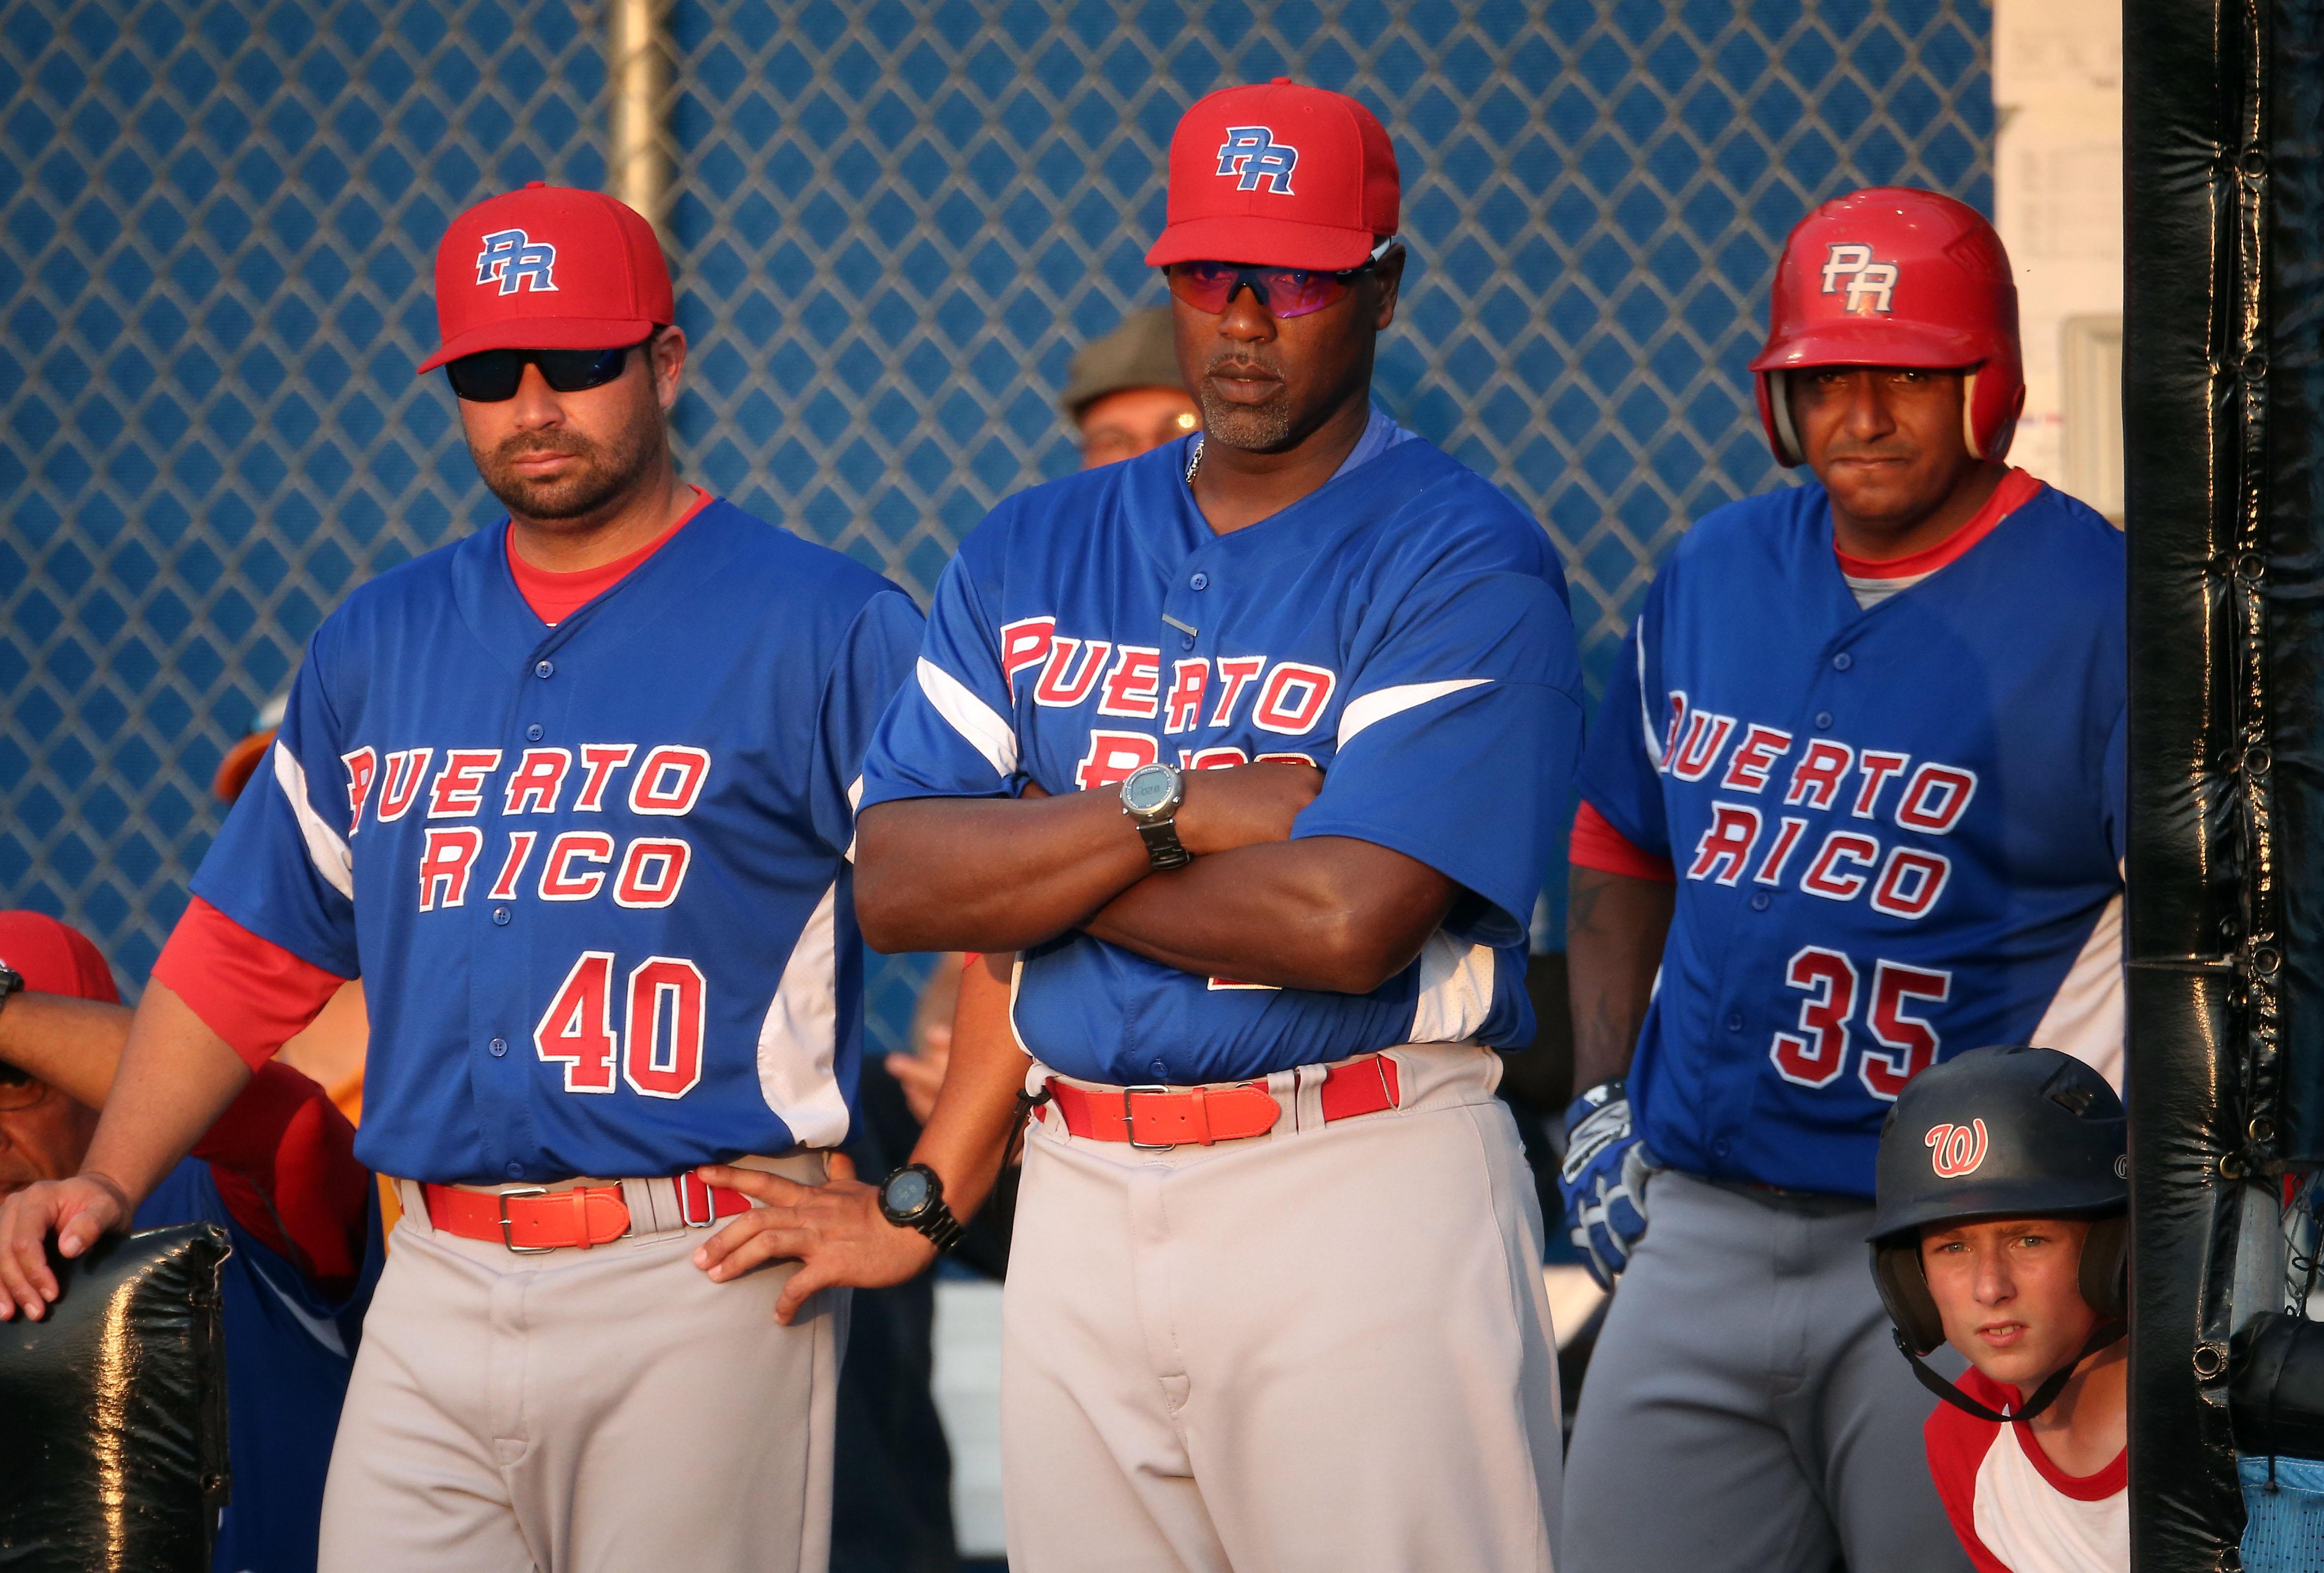 8704150-pan-am-games-baseball-puerto-rico-vs-canada